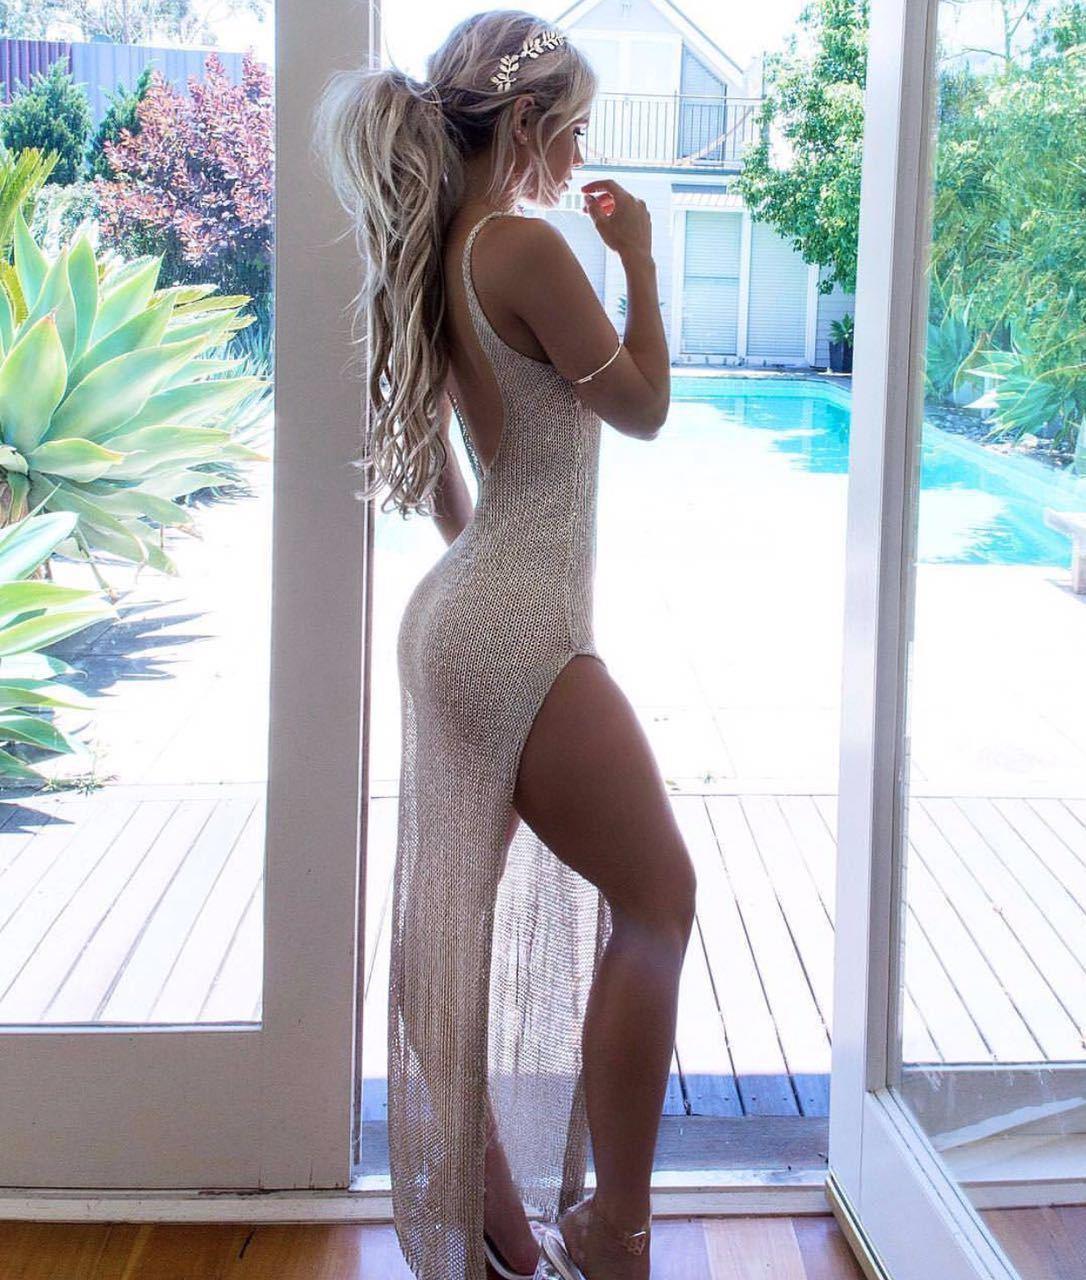 New Hot Sale Summer Mesh Sheer Long Cover-Ups Women Bathing Suit Bikini Cover Up Beach Dress Swimwear Swimsuit Dress(China)